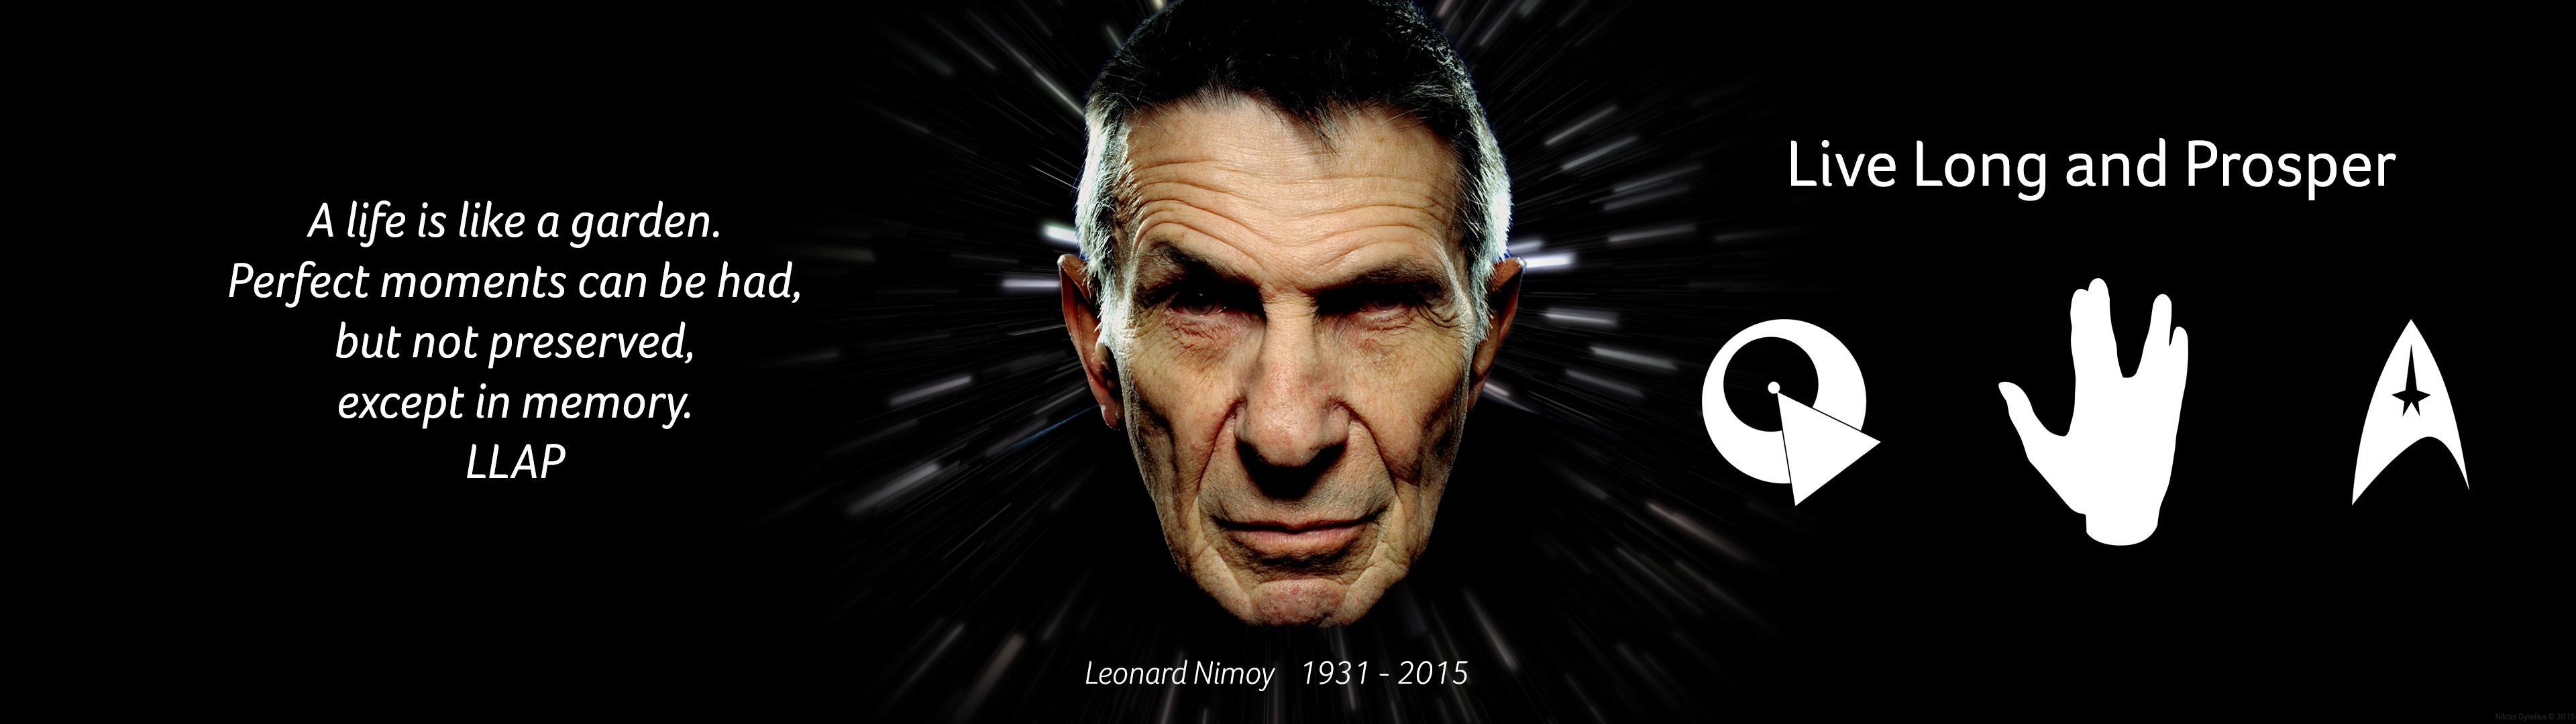 Leonard Nimoy tribute, dual screen [3840×1080] …